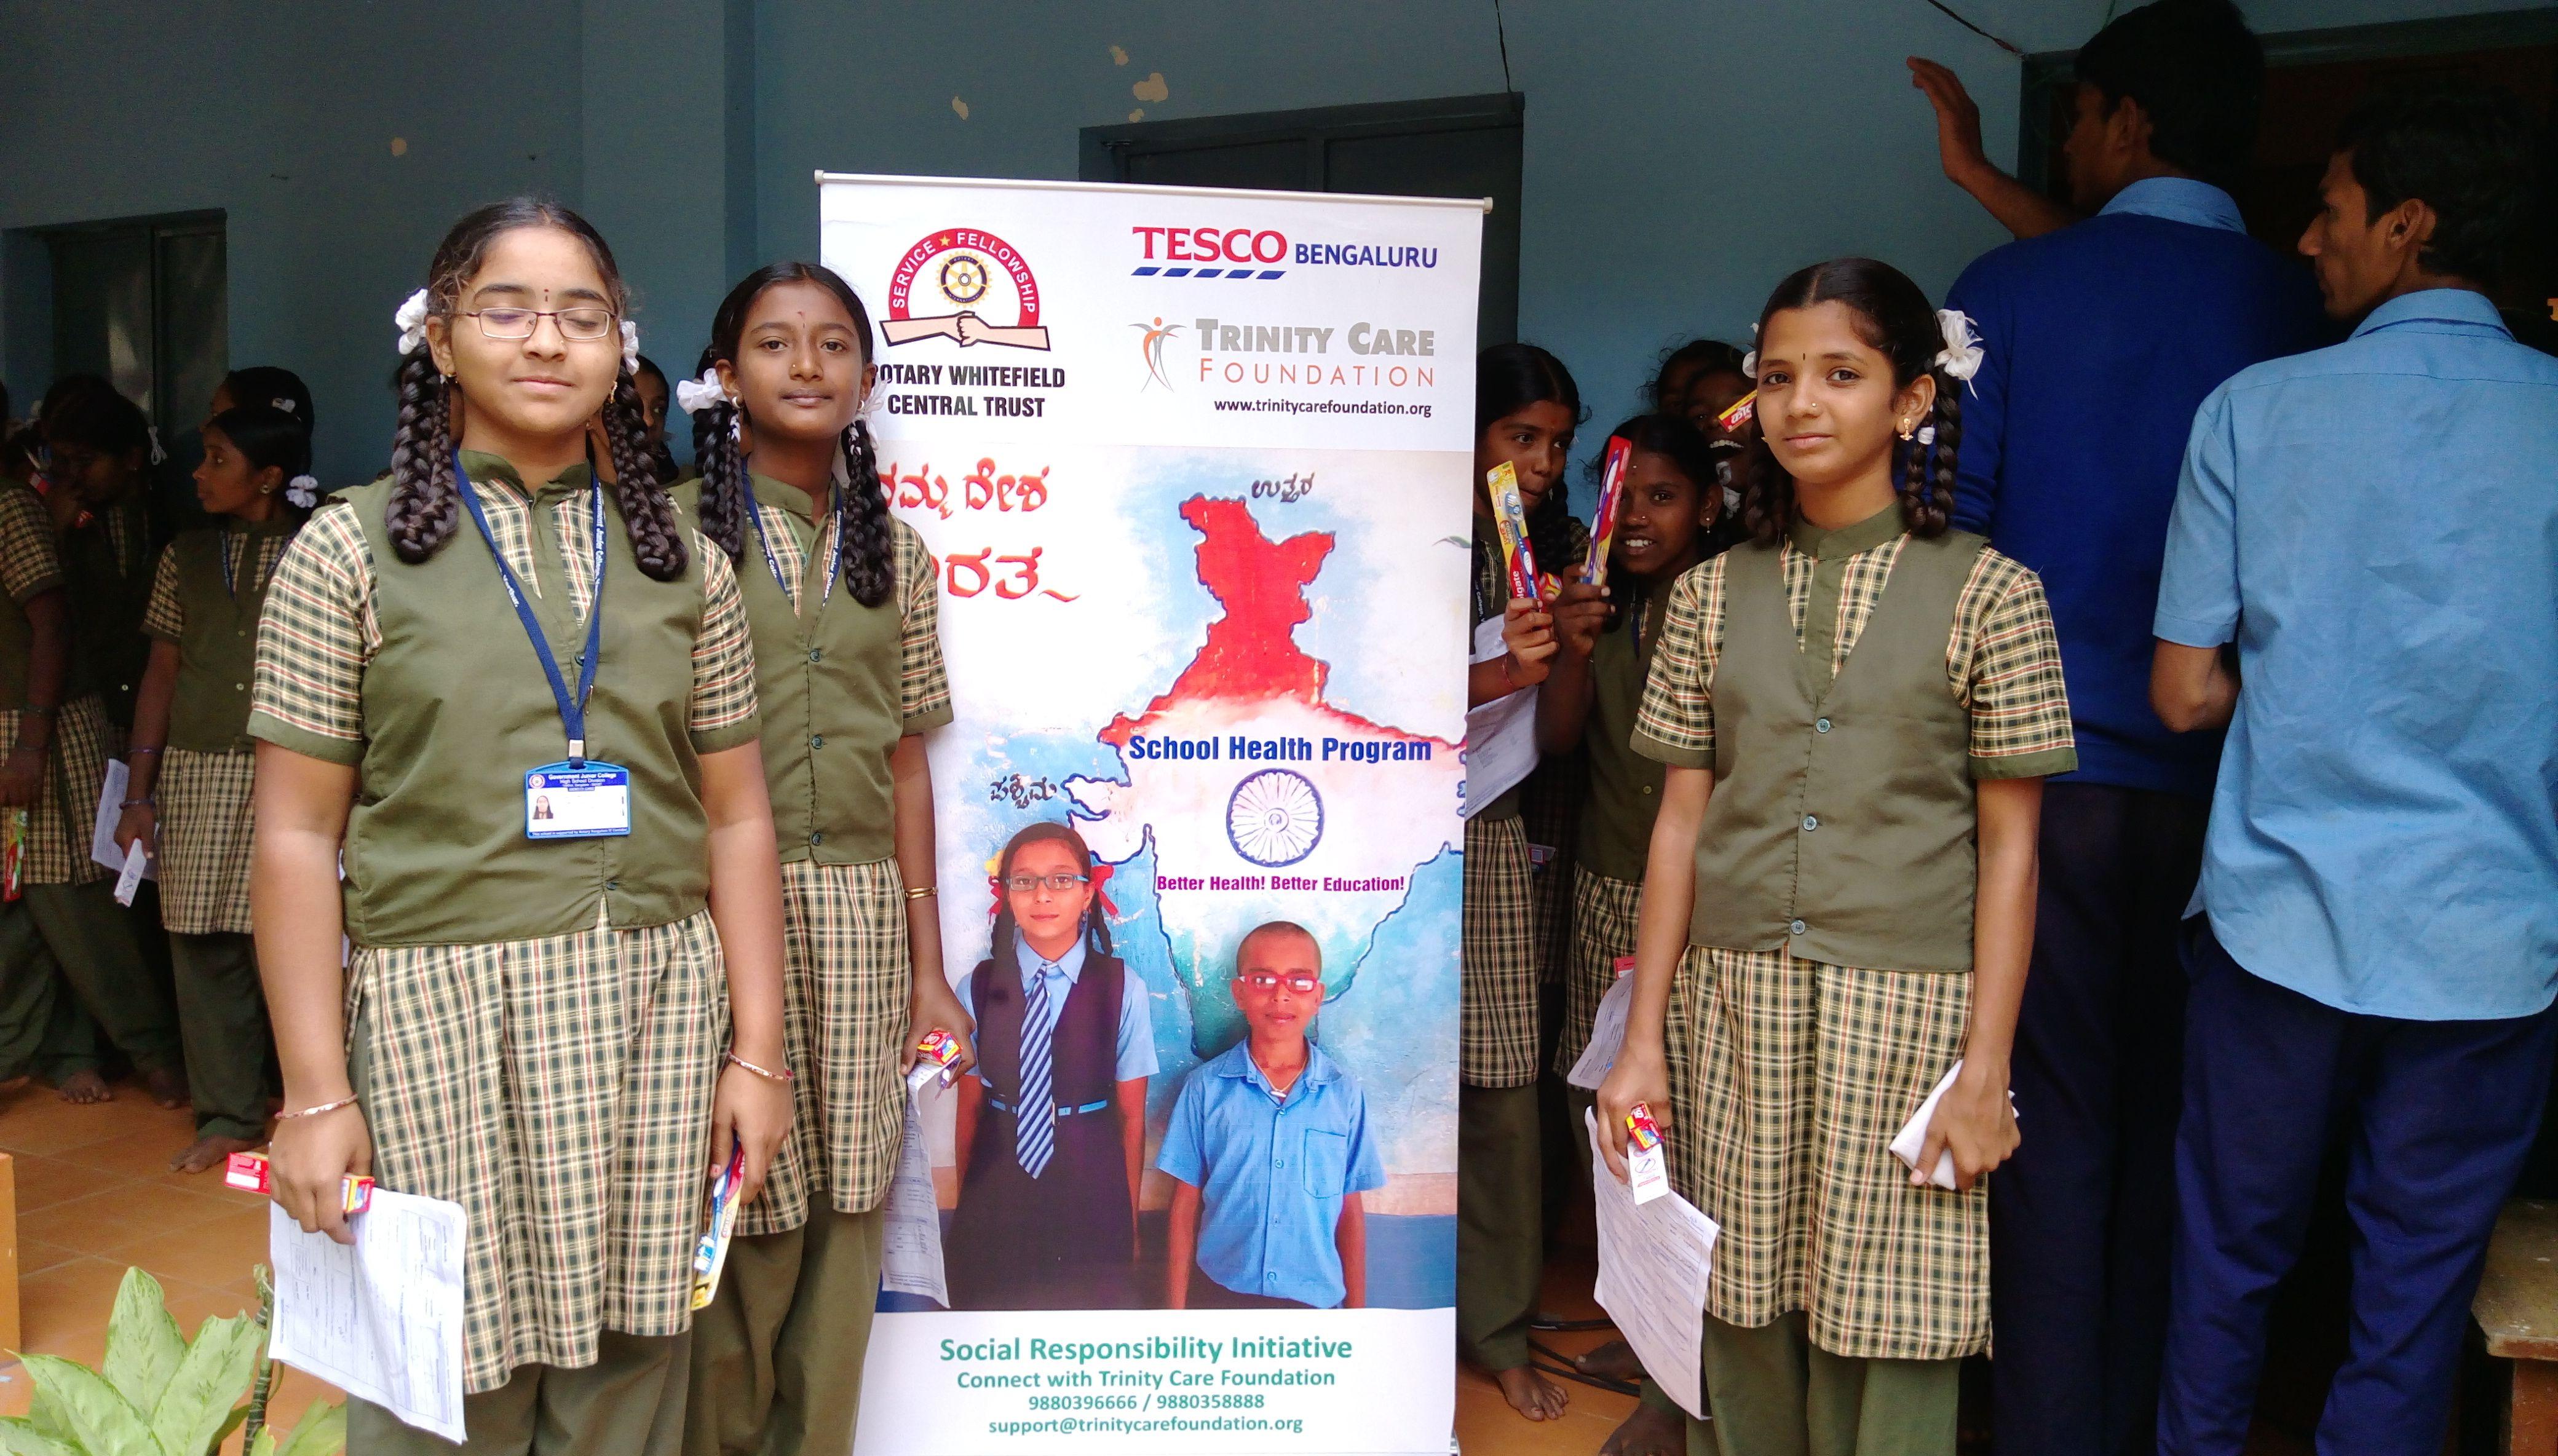 School Health Program by